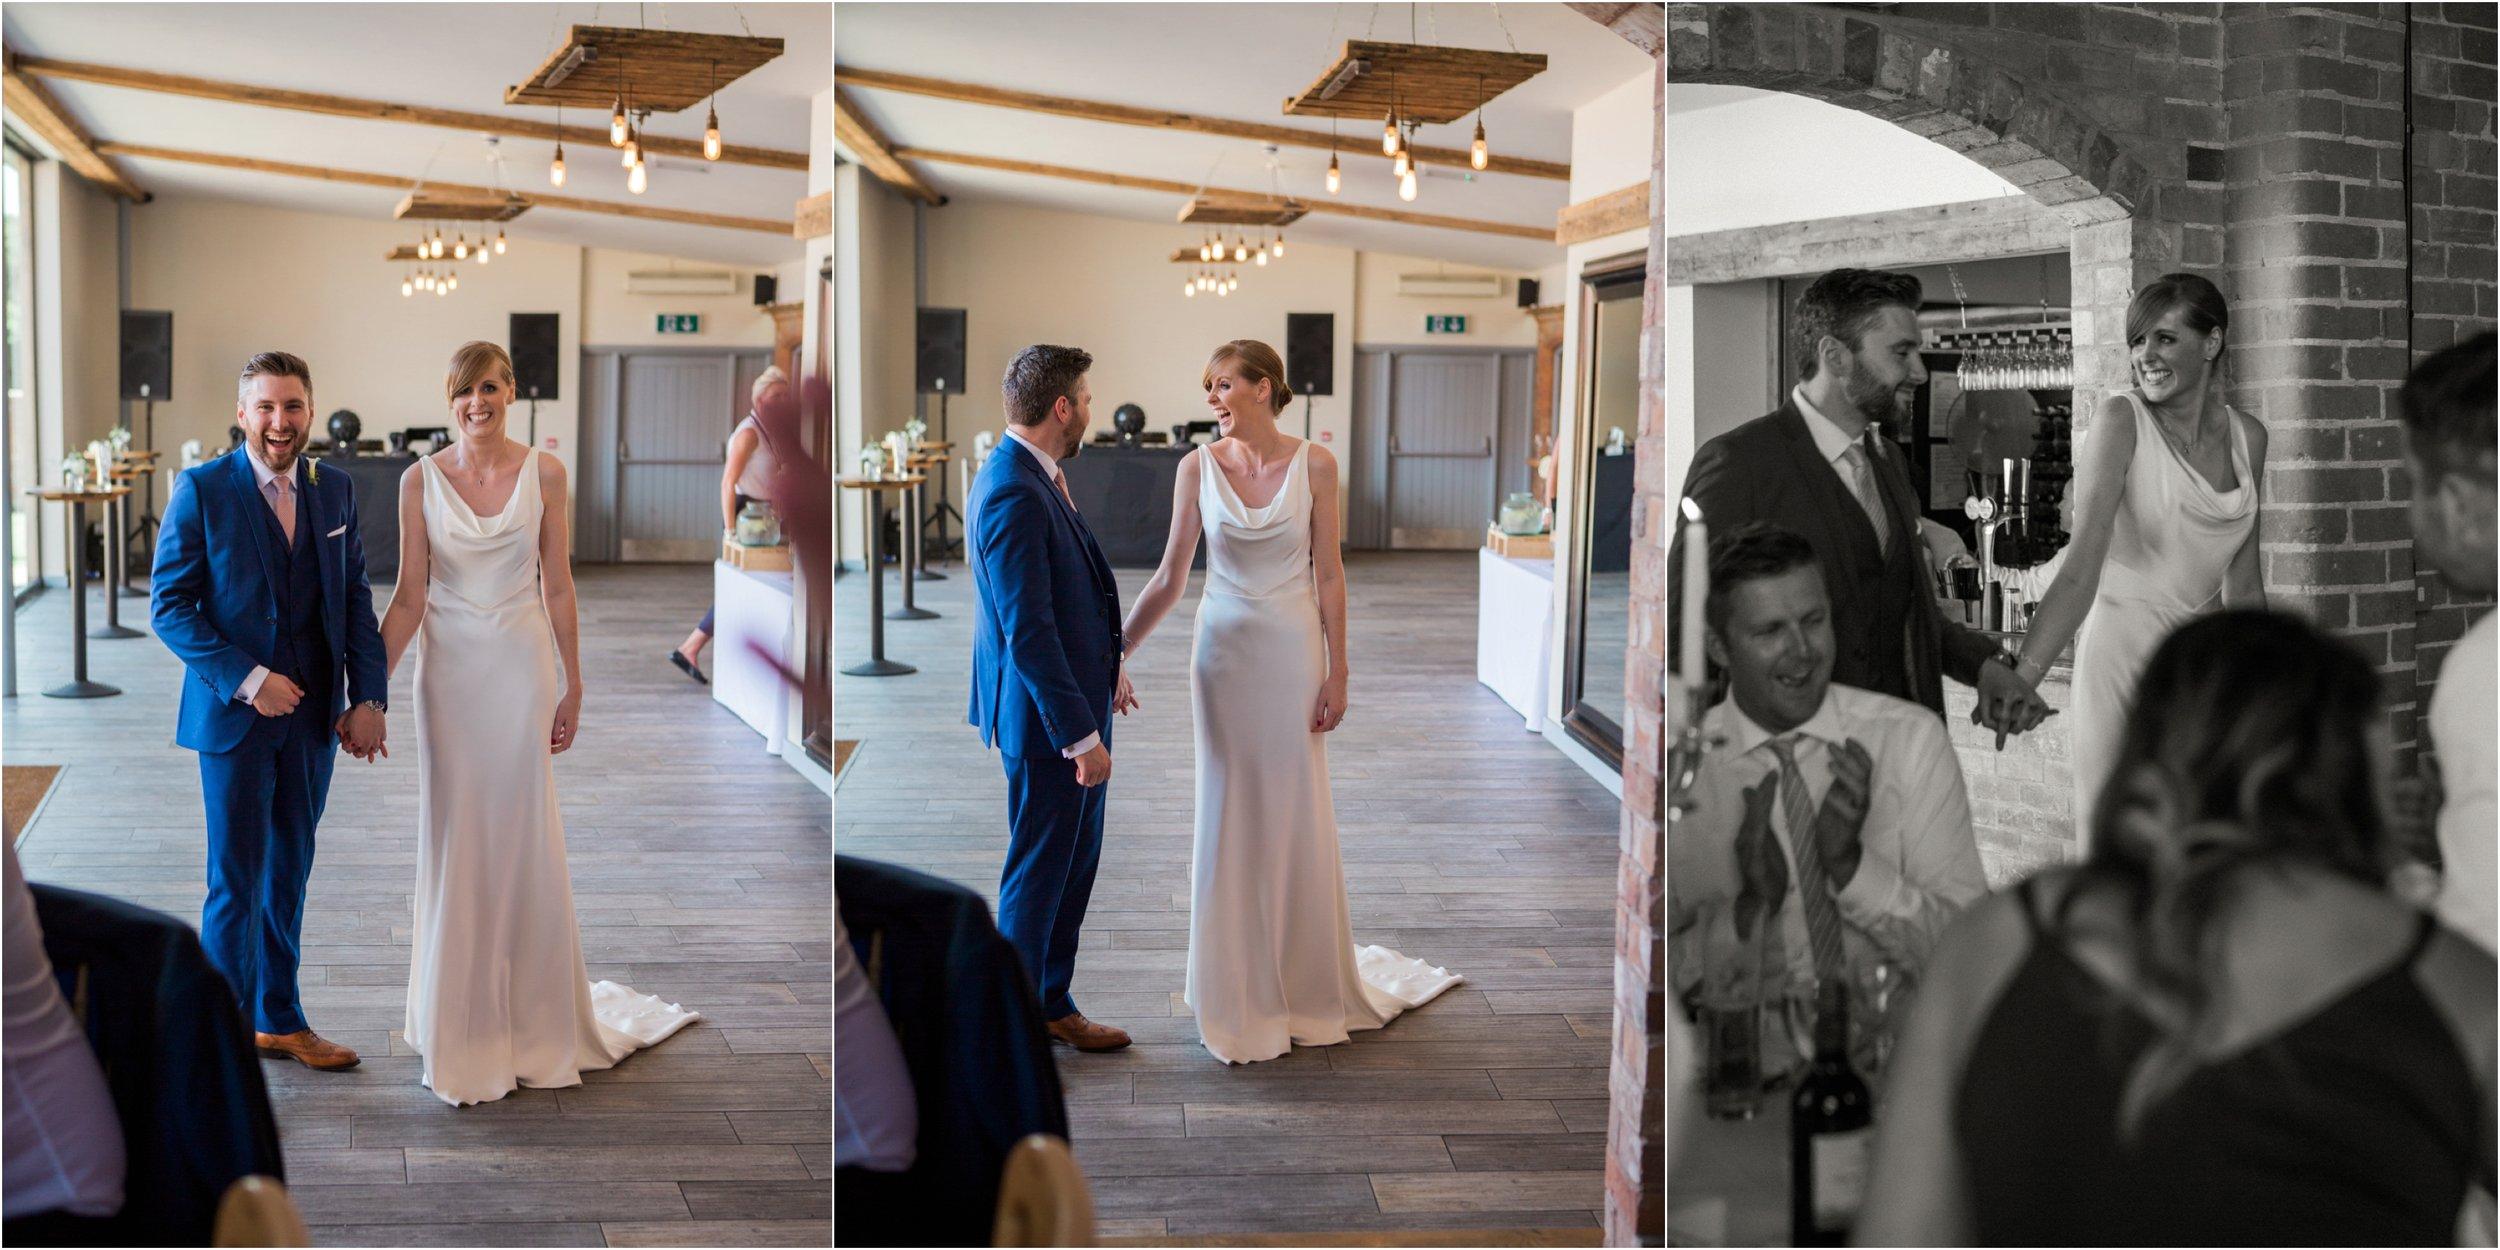 Sophie Evans Photography, Claire & John, Swallows Nest Barn Wedding, Warwickshire Wedding Photographer-130.jpg